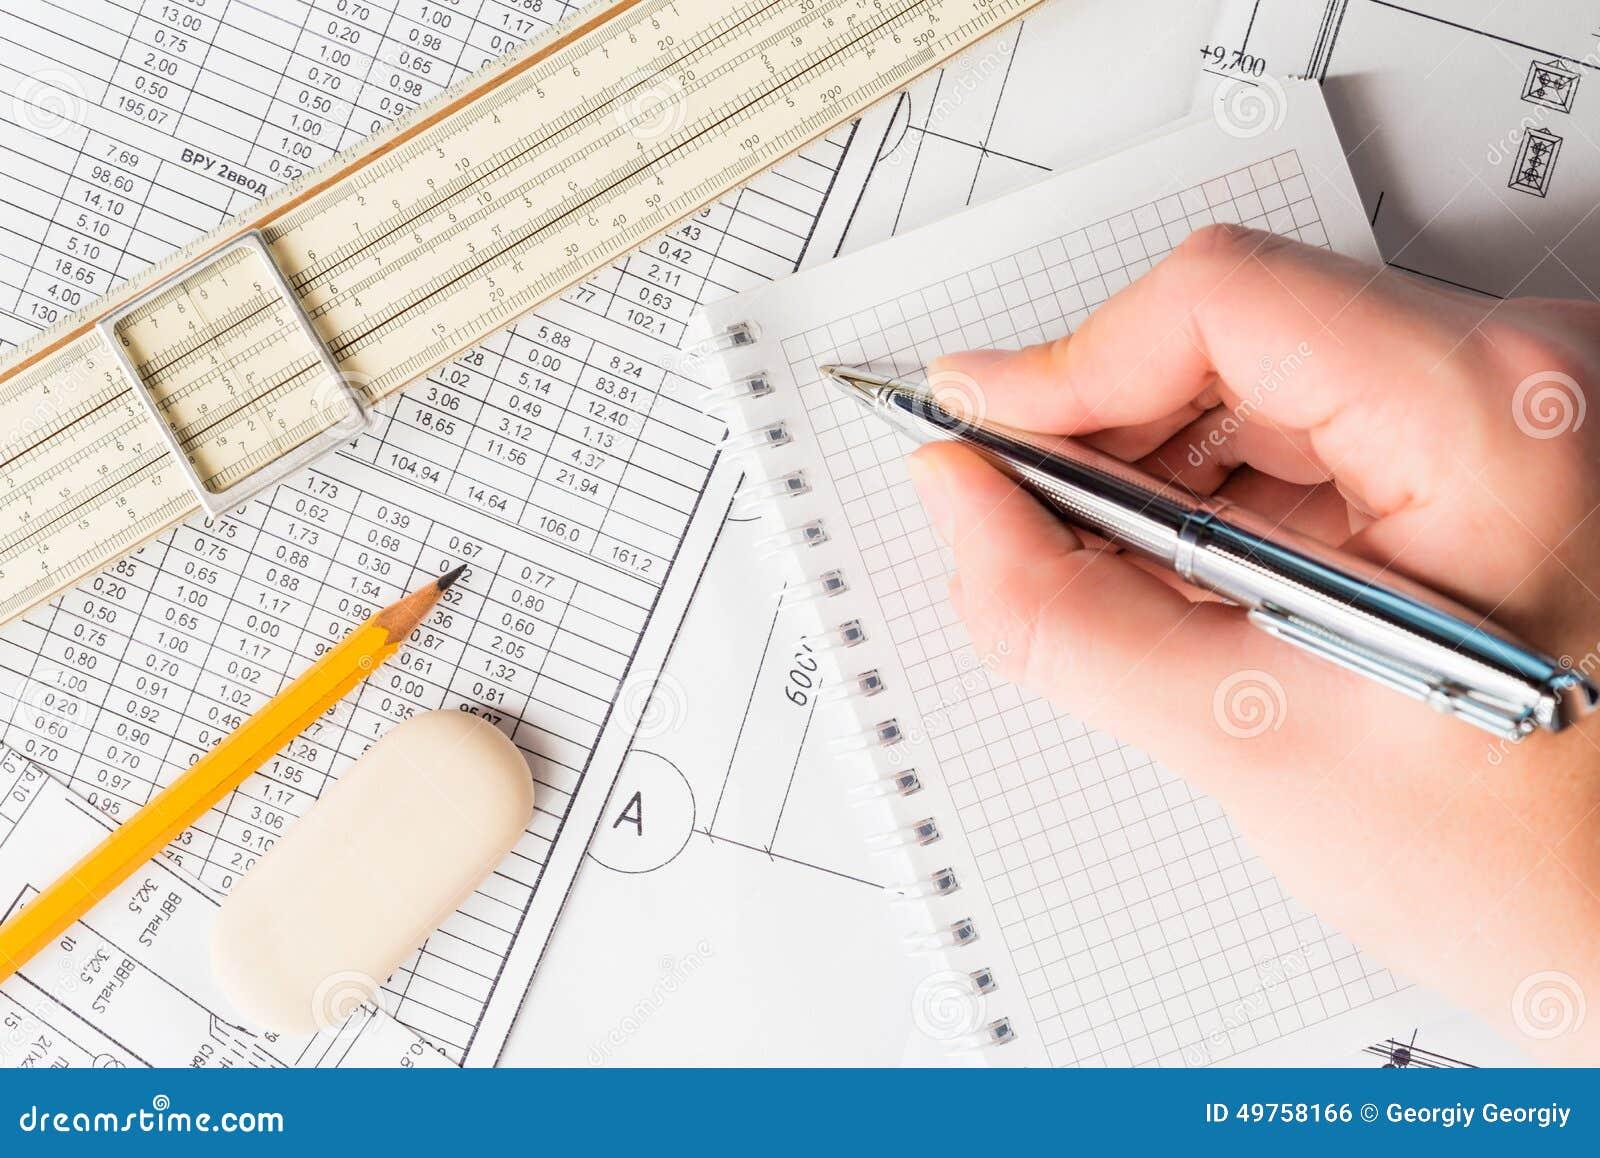 improve handwriting architectural engineering